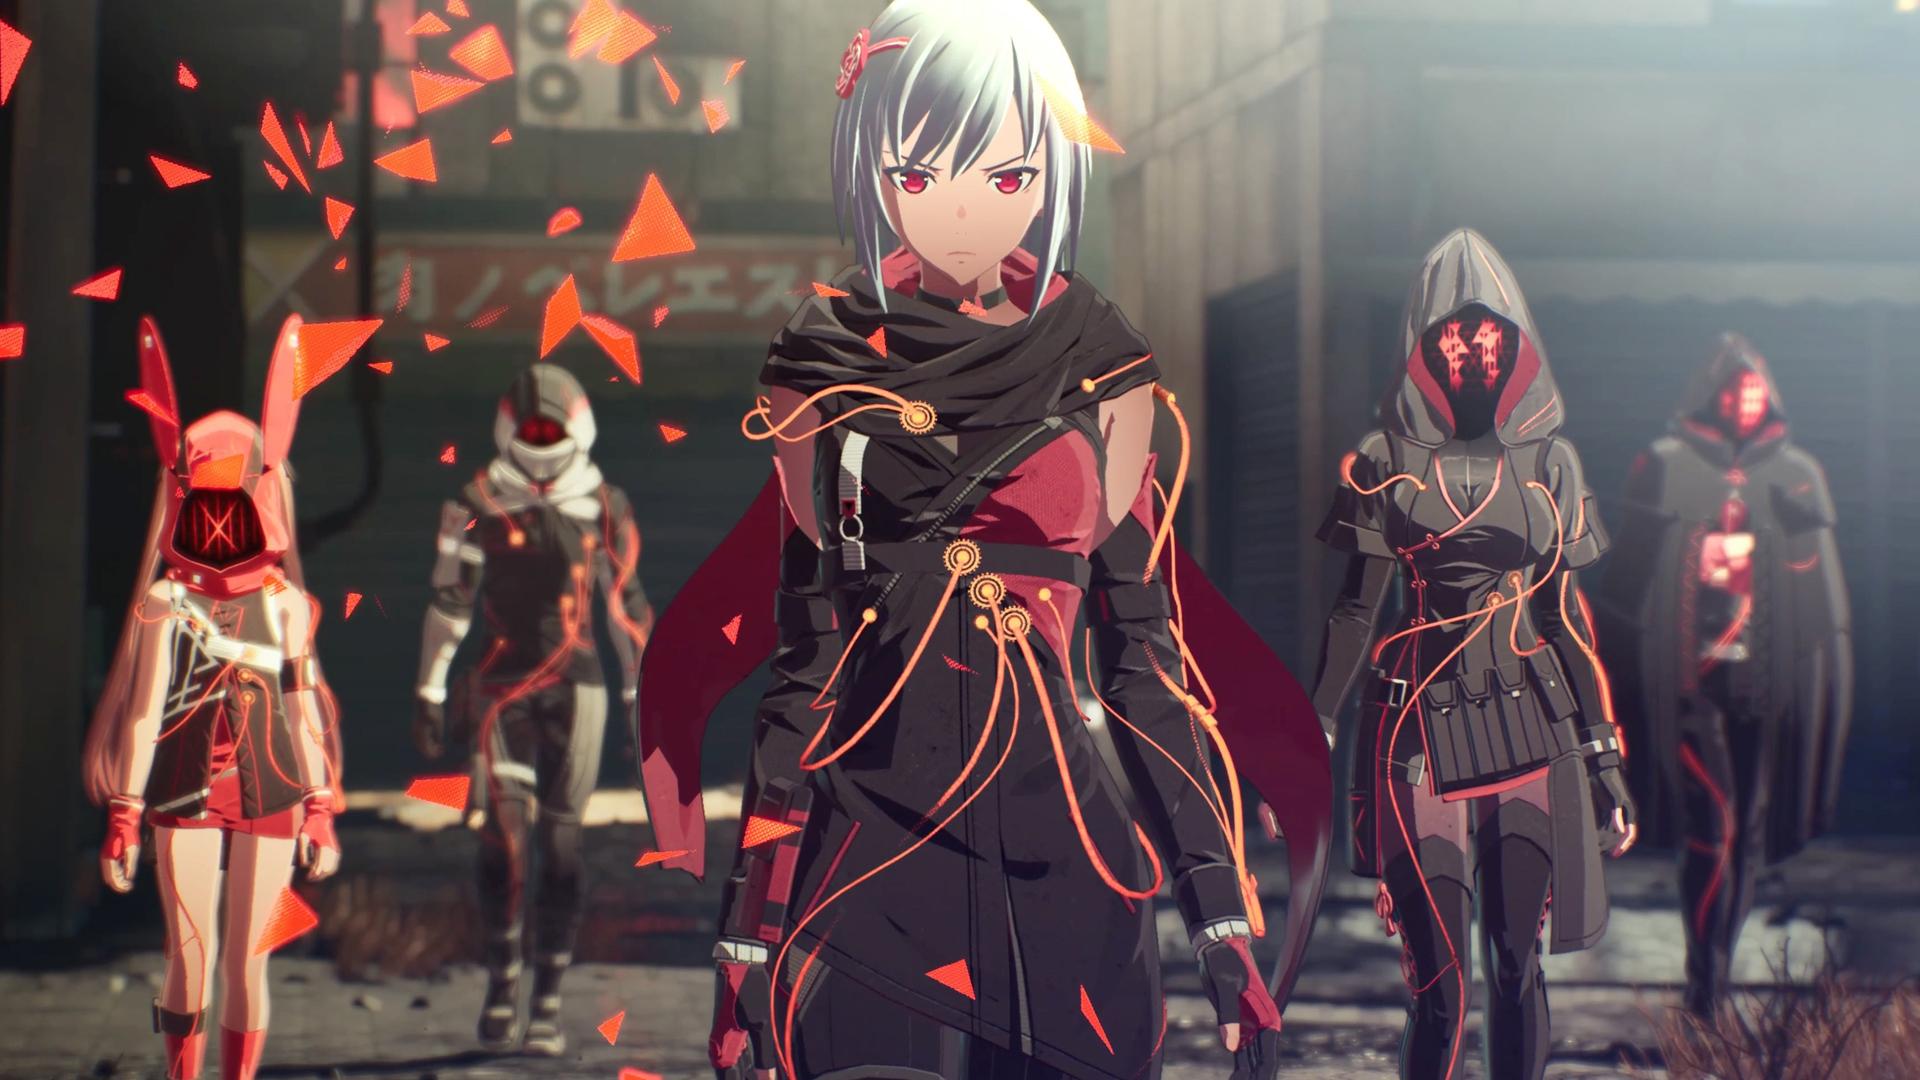 Bandai Namco säger att Scarlet Nexus inte ingår med Xbox Game Pass